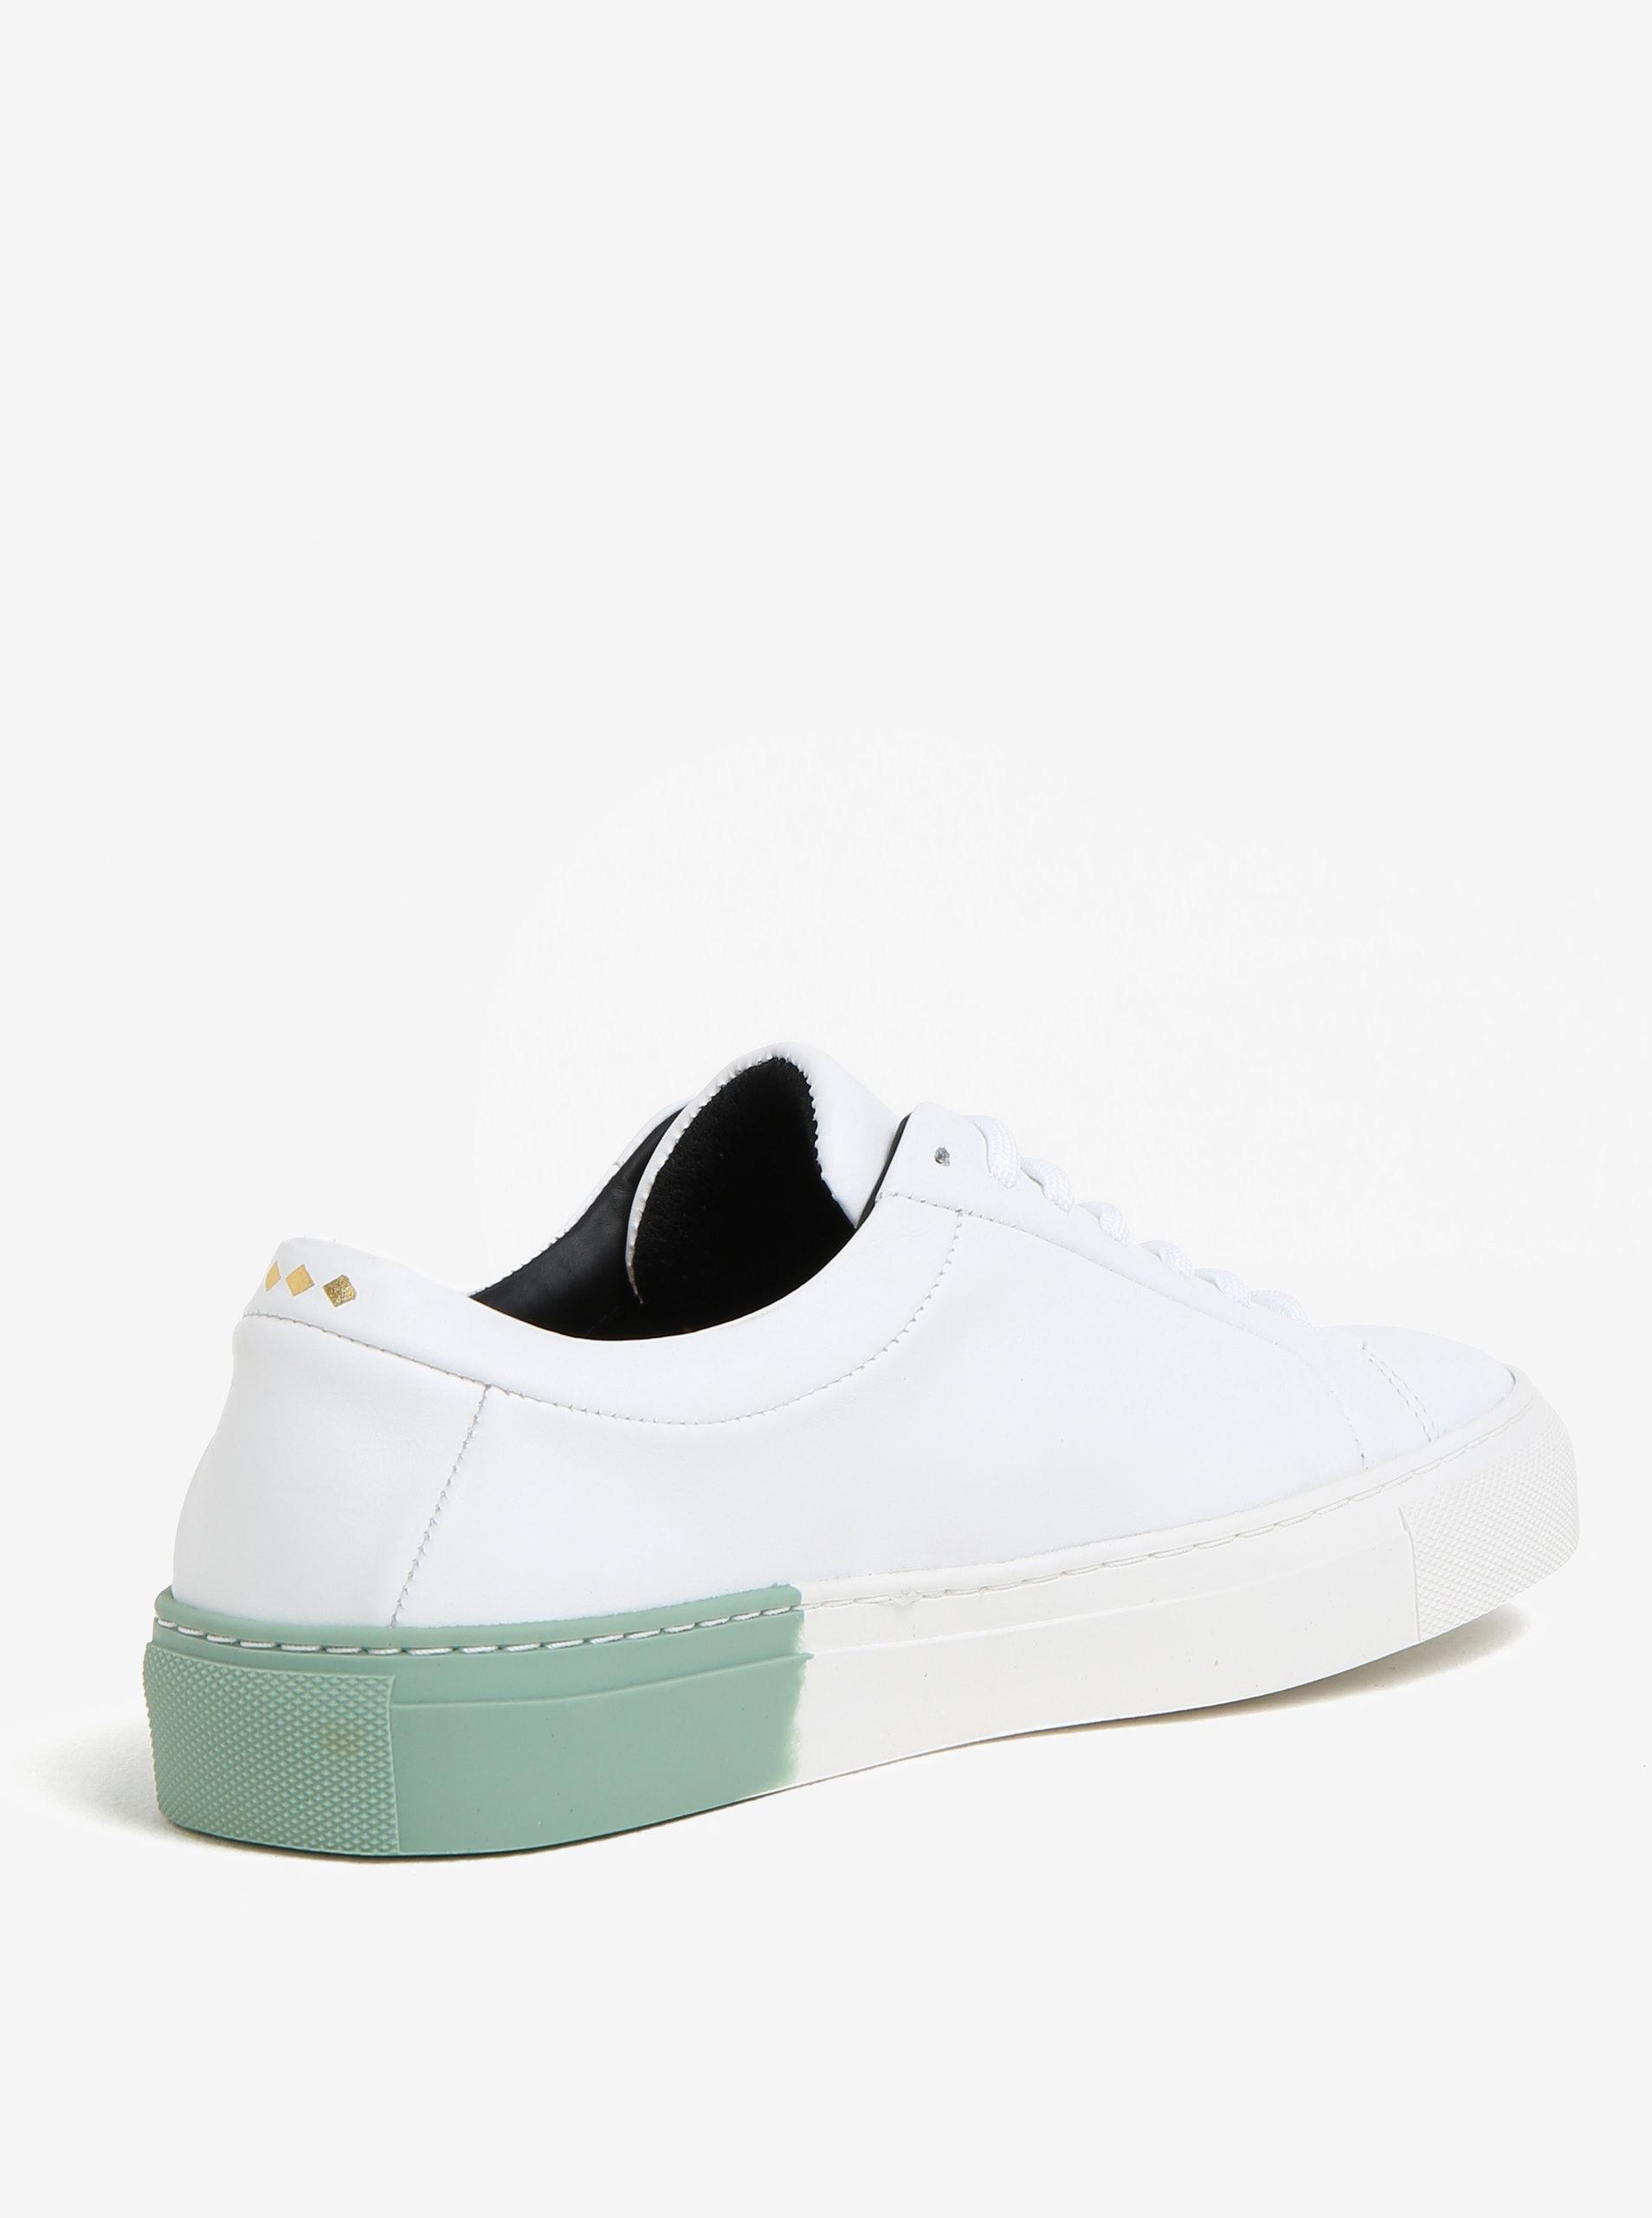 181b31d52b Zeleno-biele dámske kožené tenisky Royal RepubliQ ...